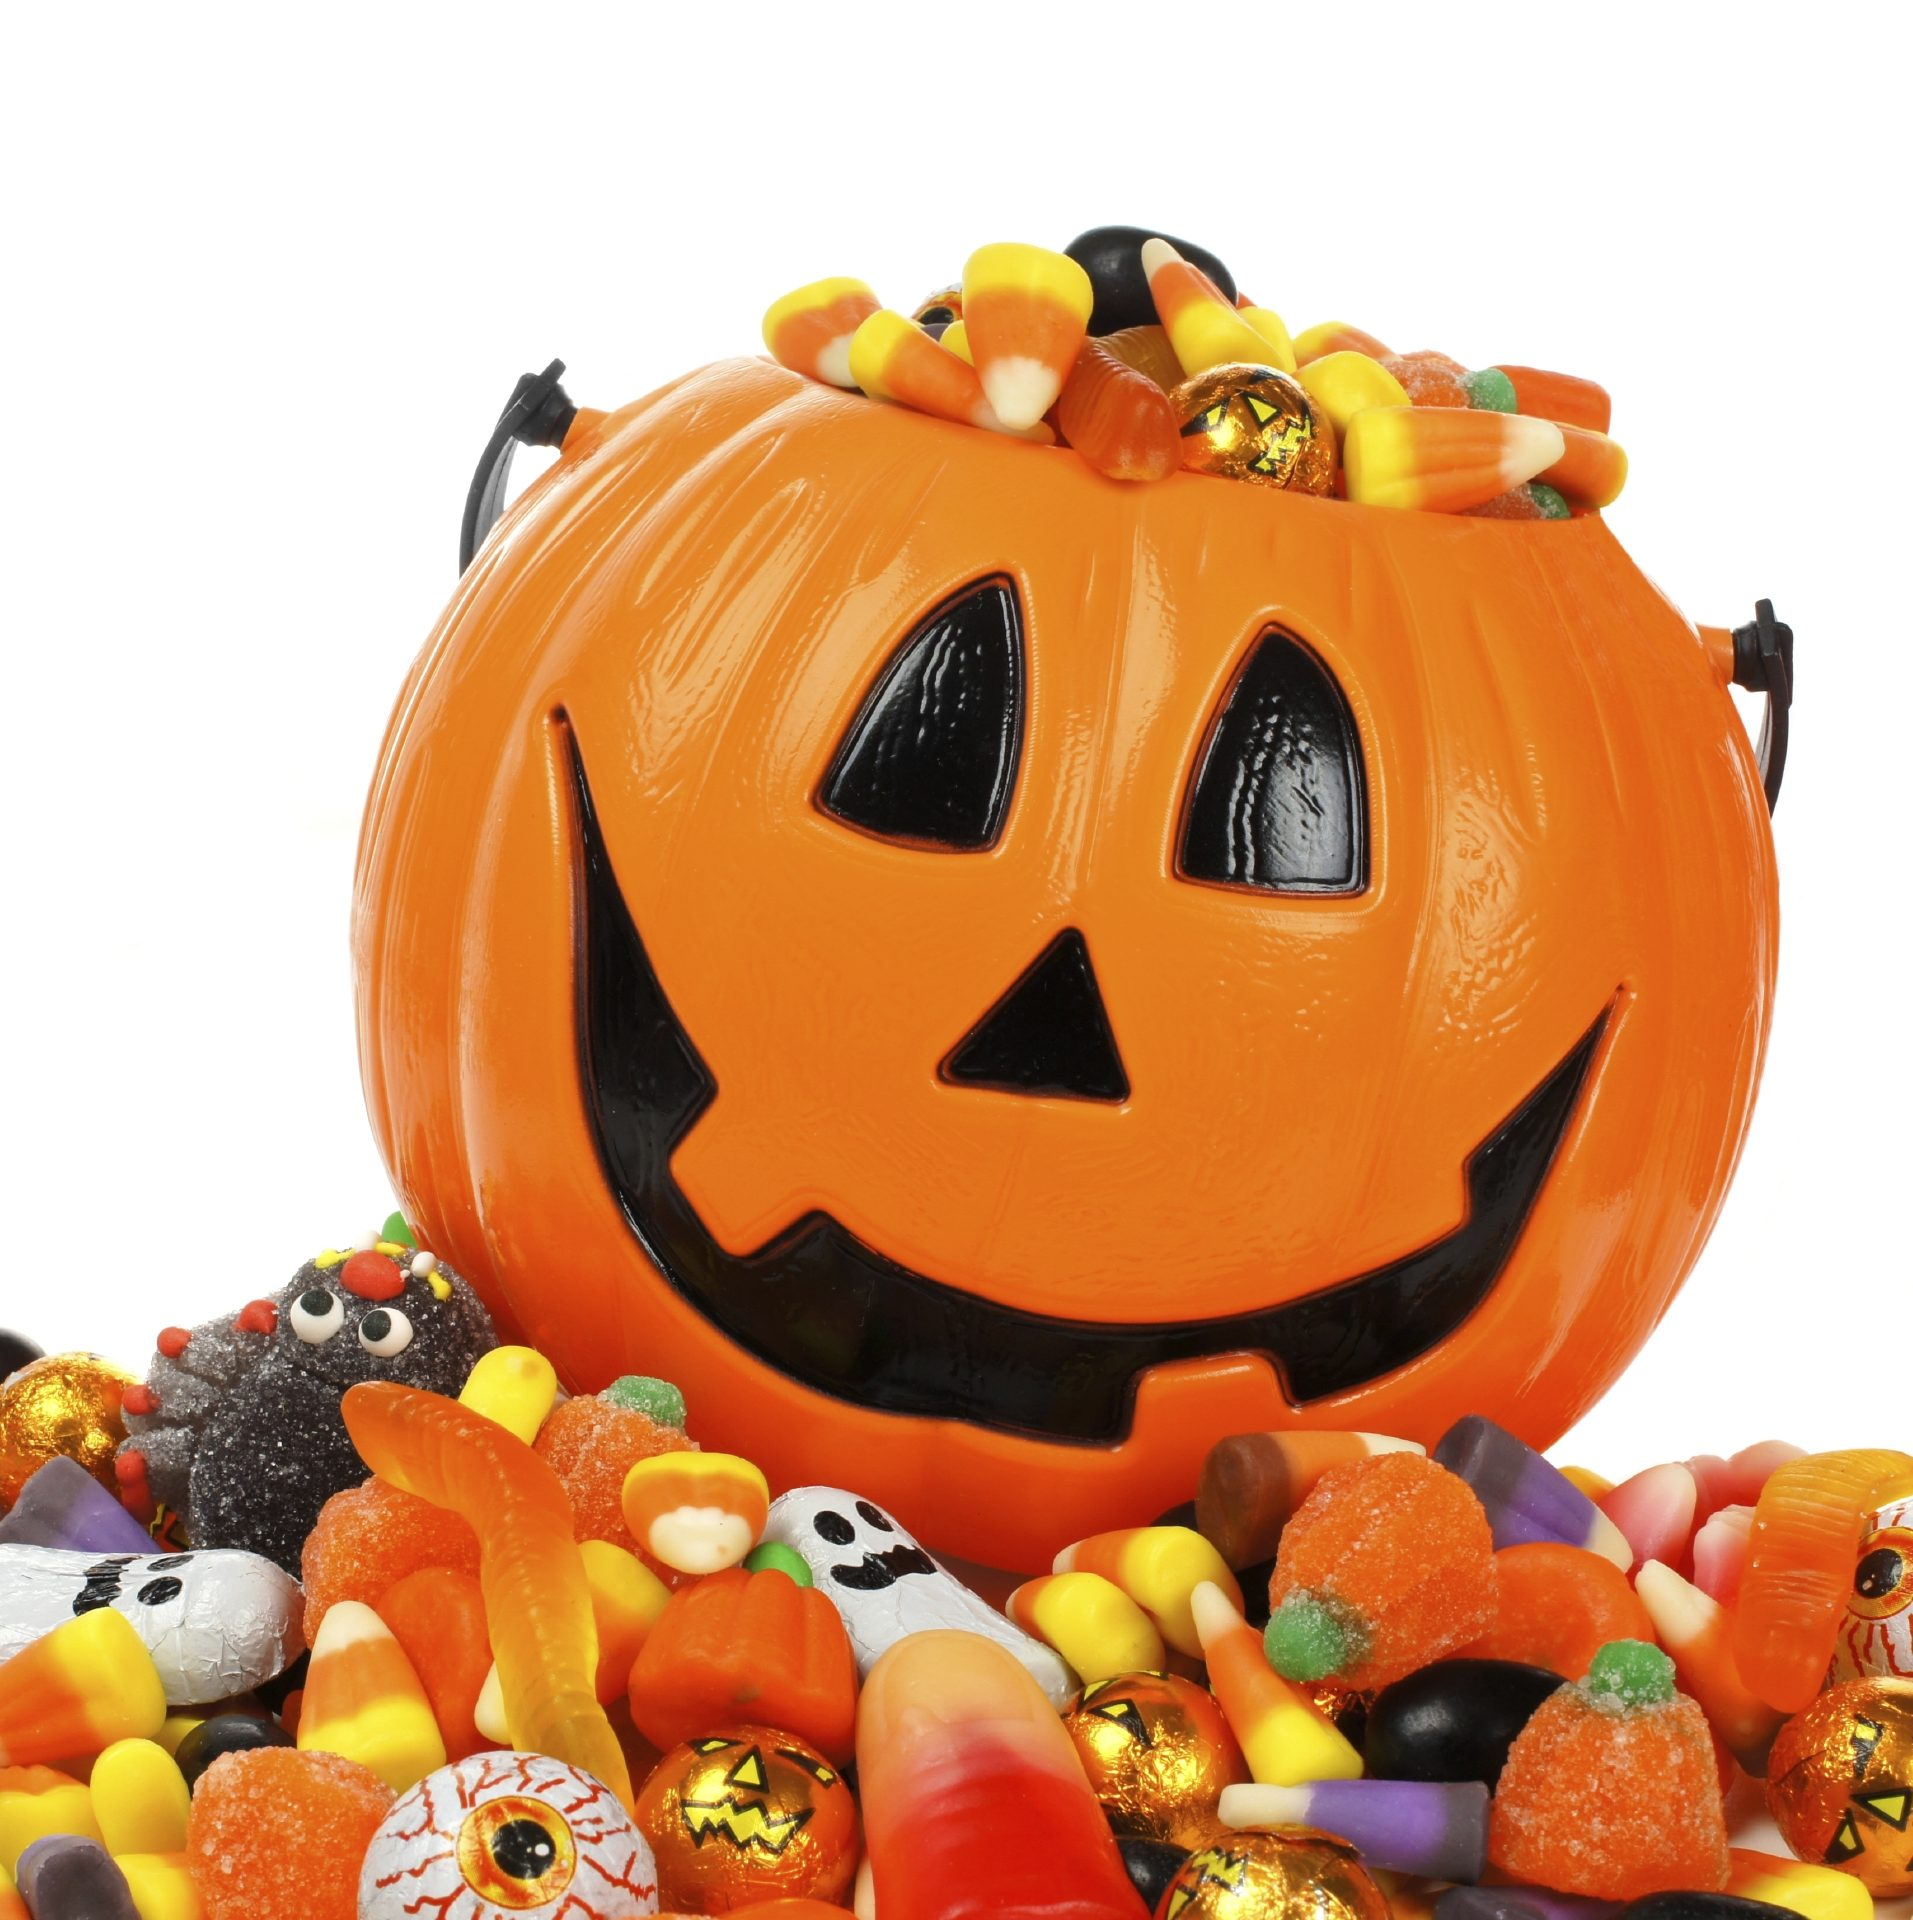 Braces-Friendly Alternatives to Halloween Candy